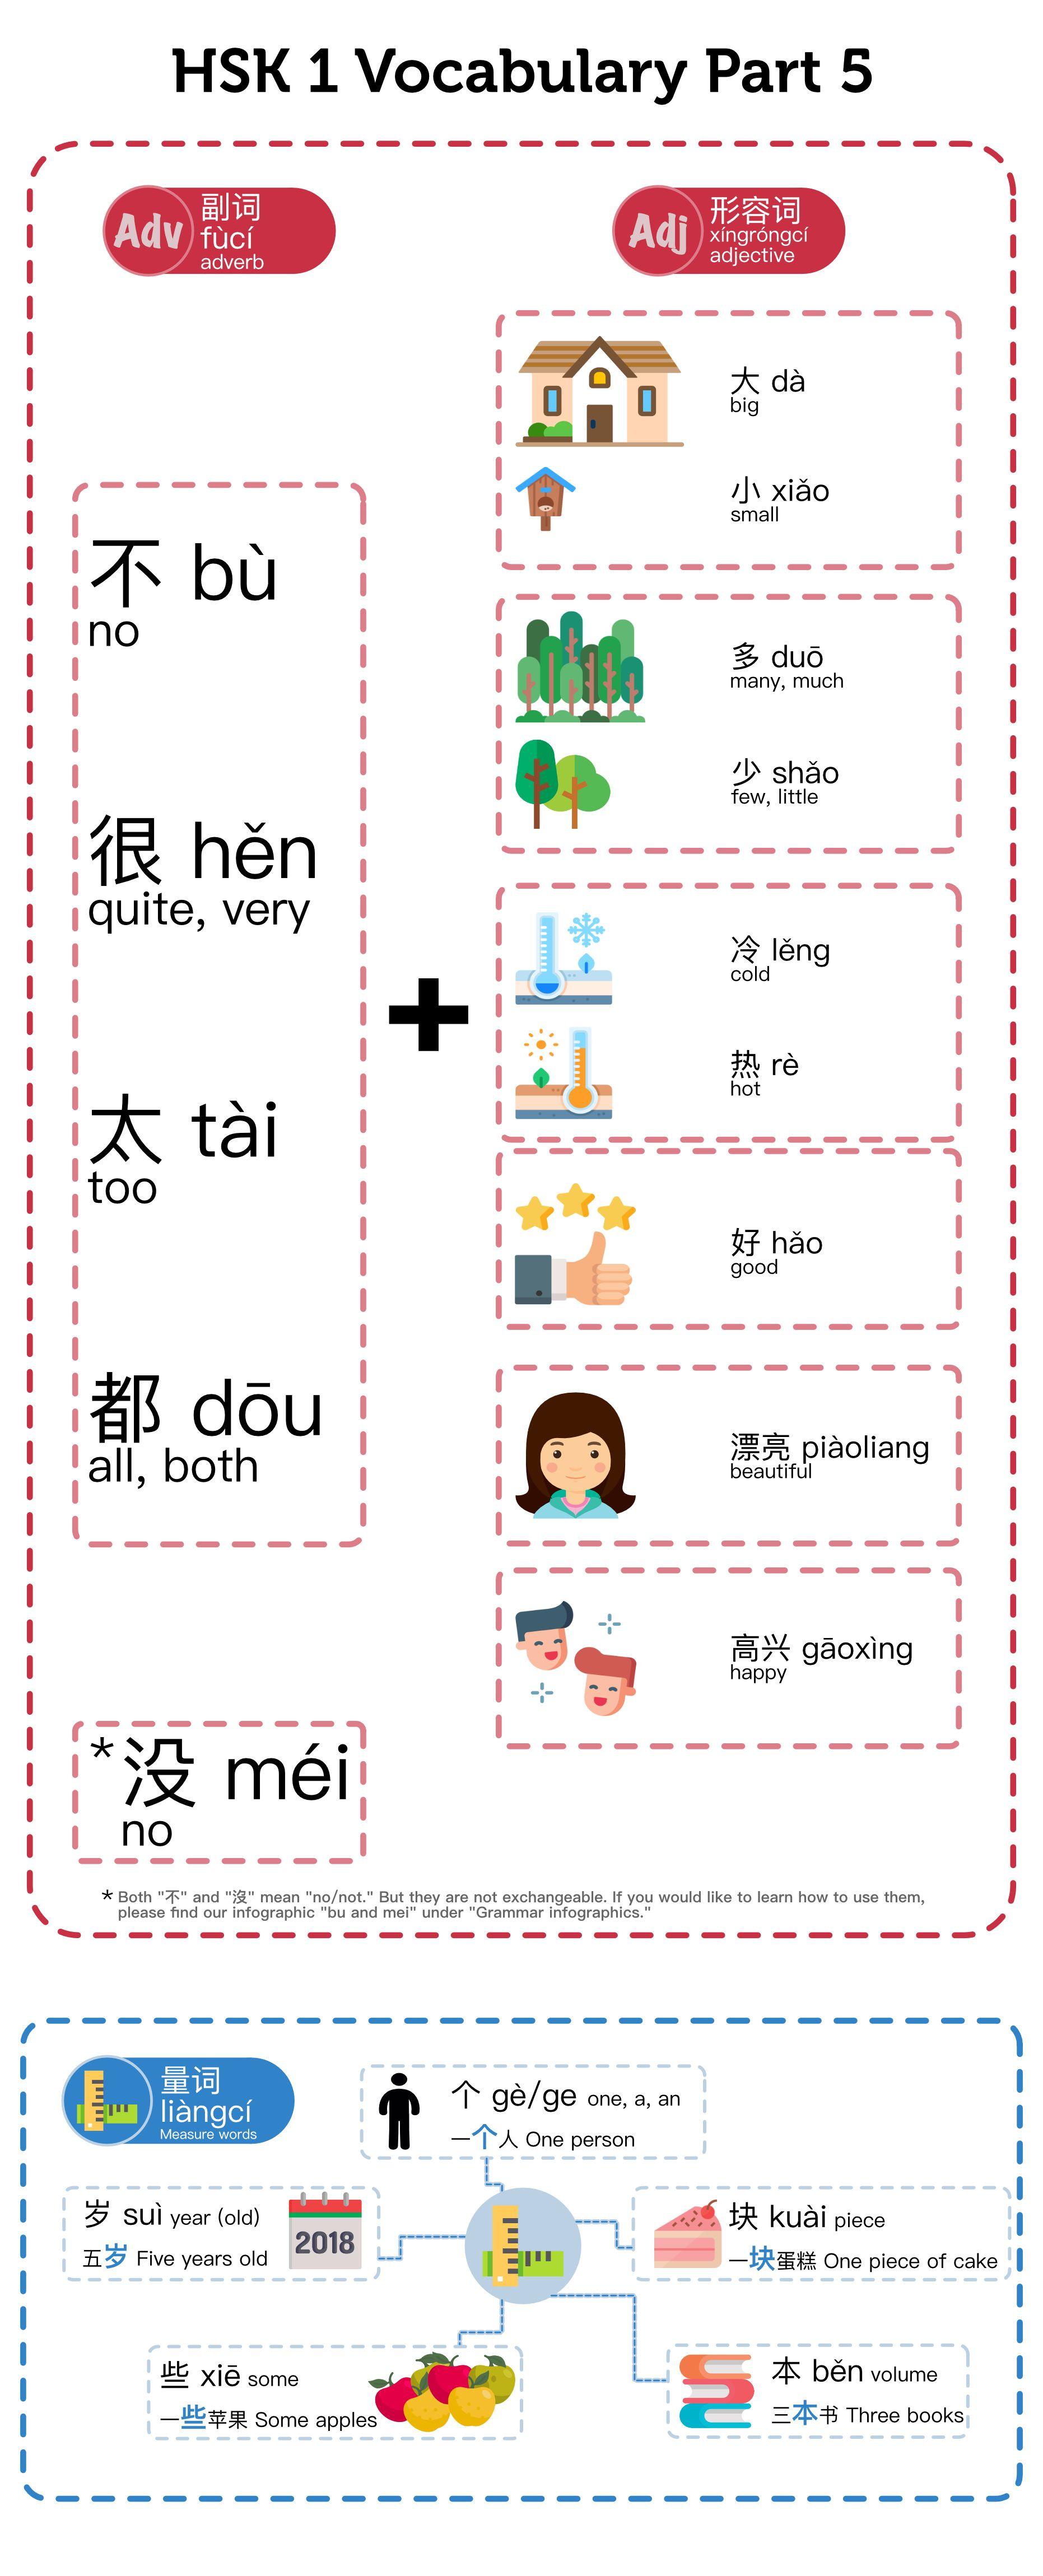 Hsk 1 Vocabulary Part 5